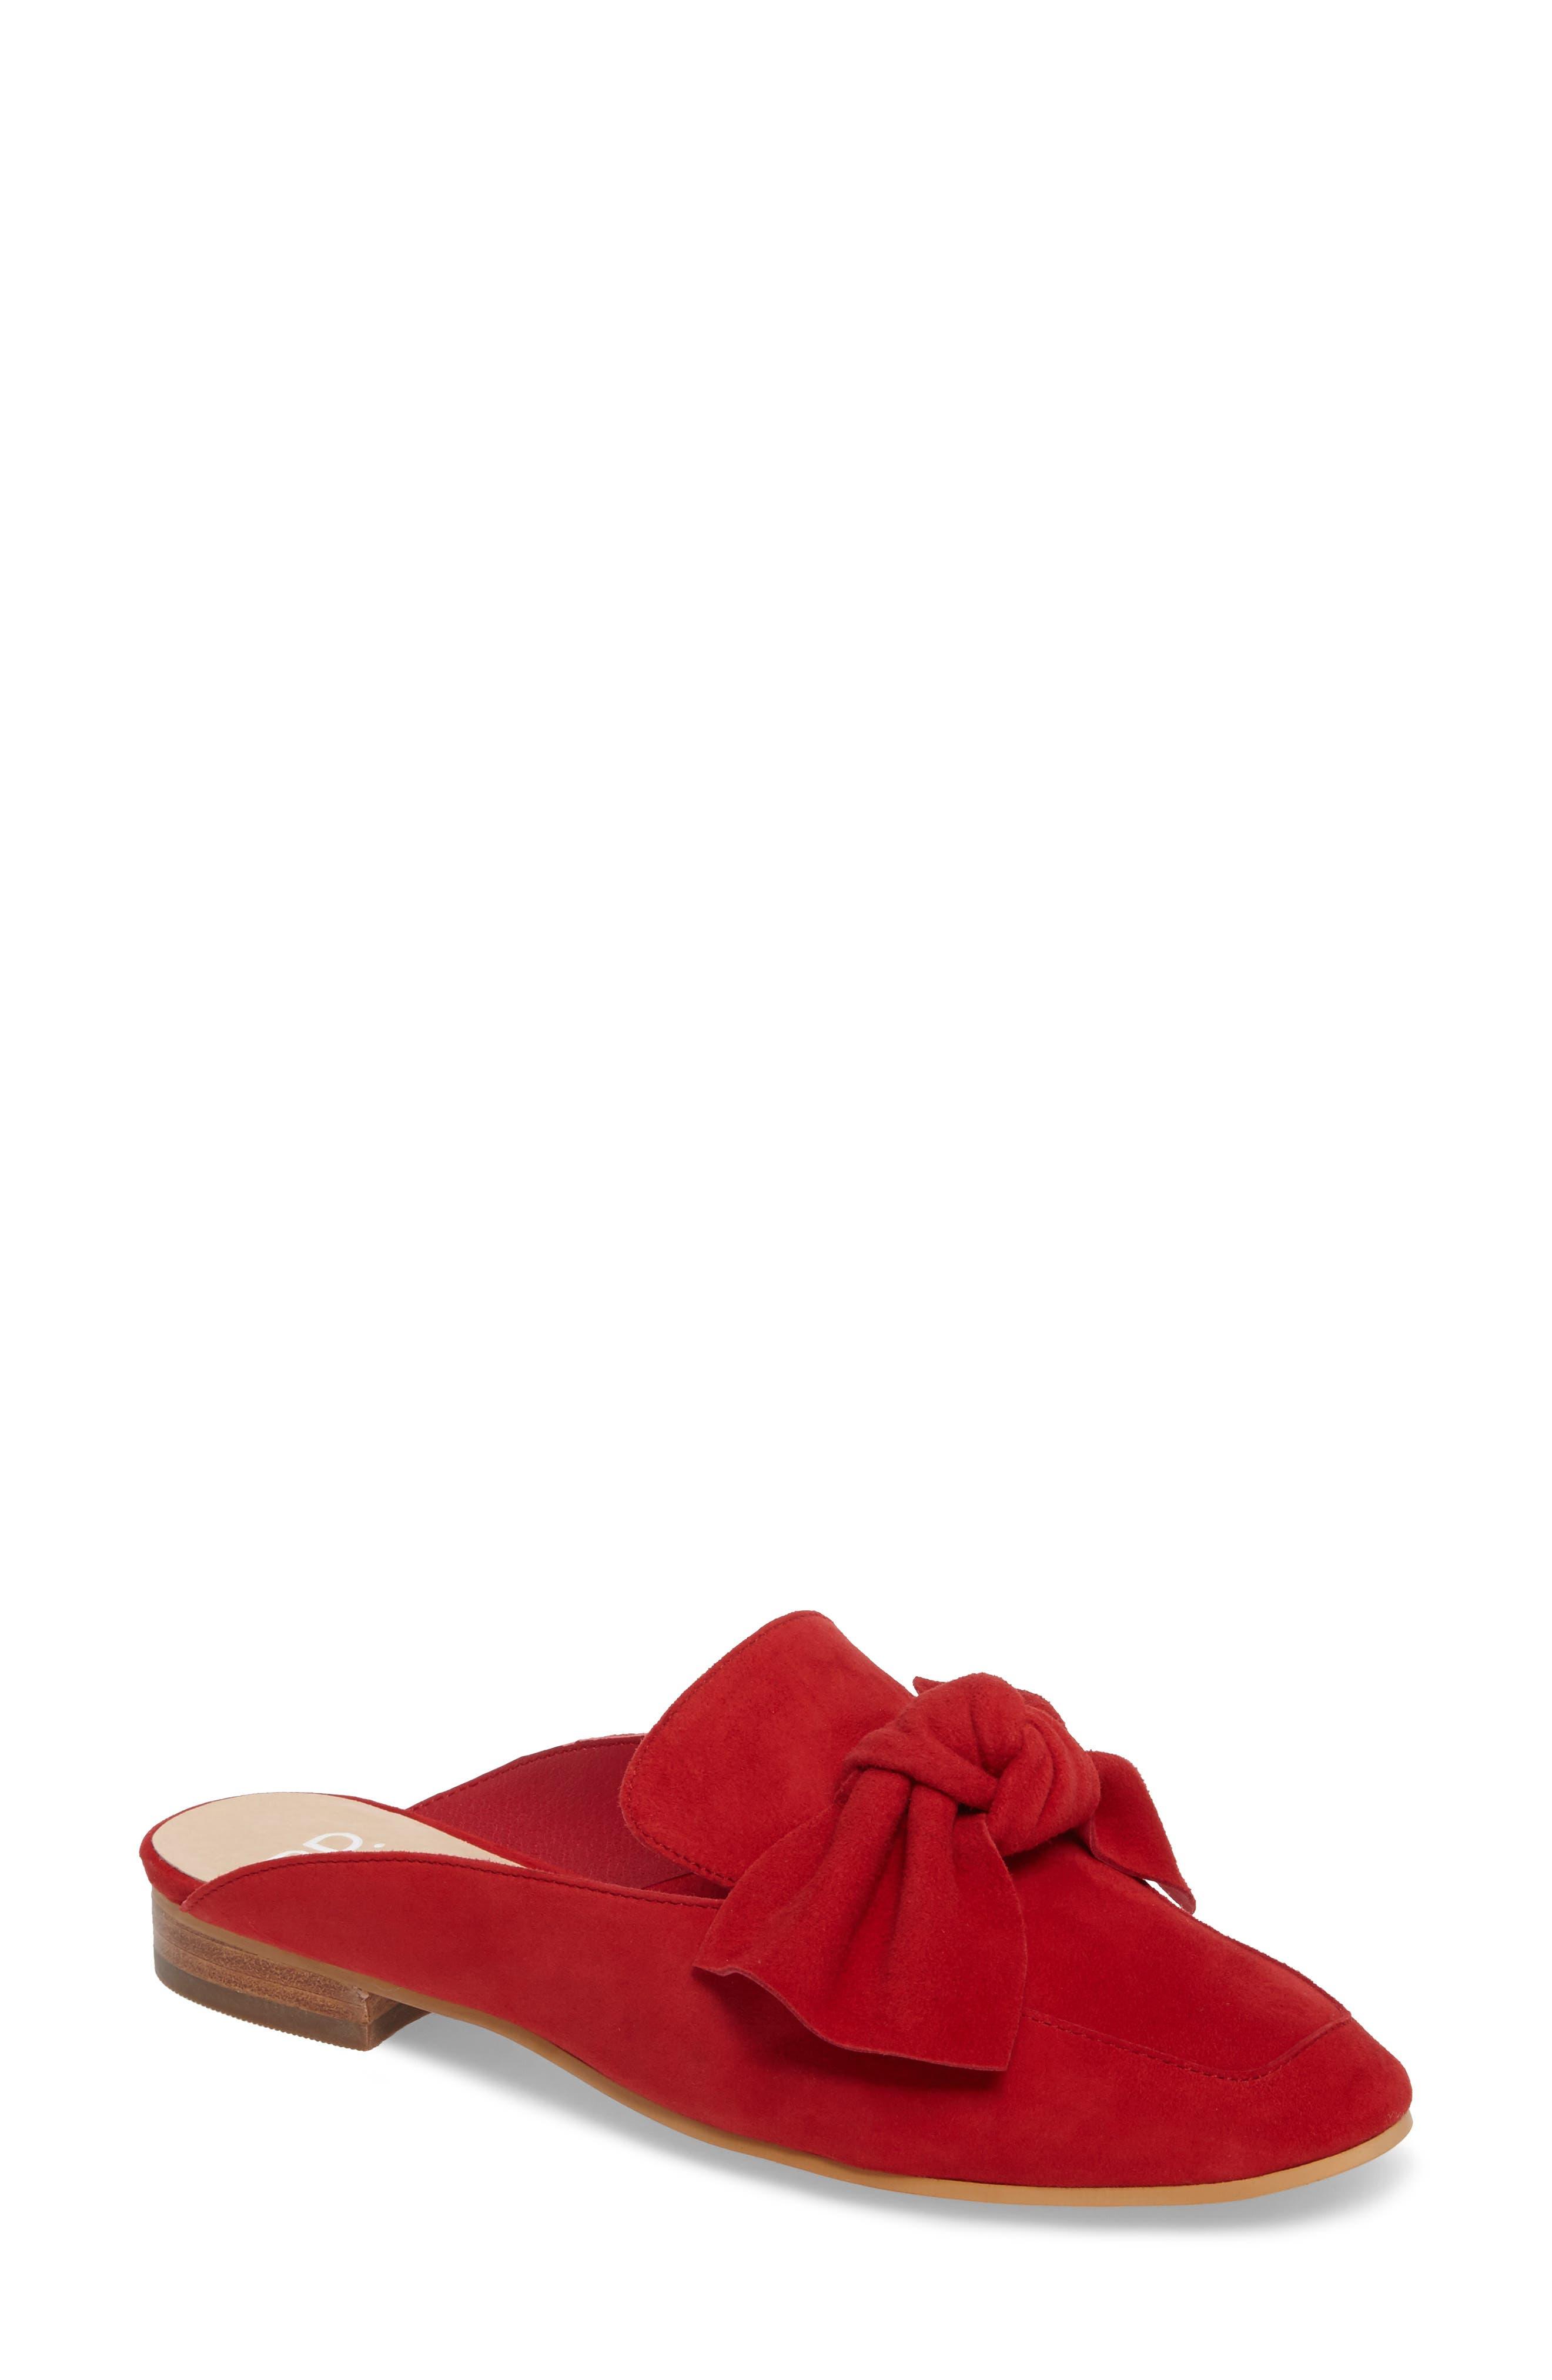 Womens Flats Paprika Womens Sanger H Sandals Flats Clearance Sale